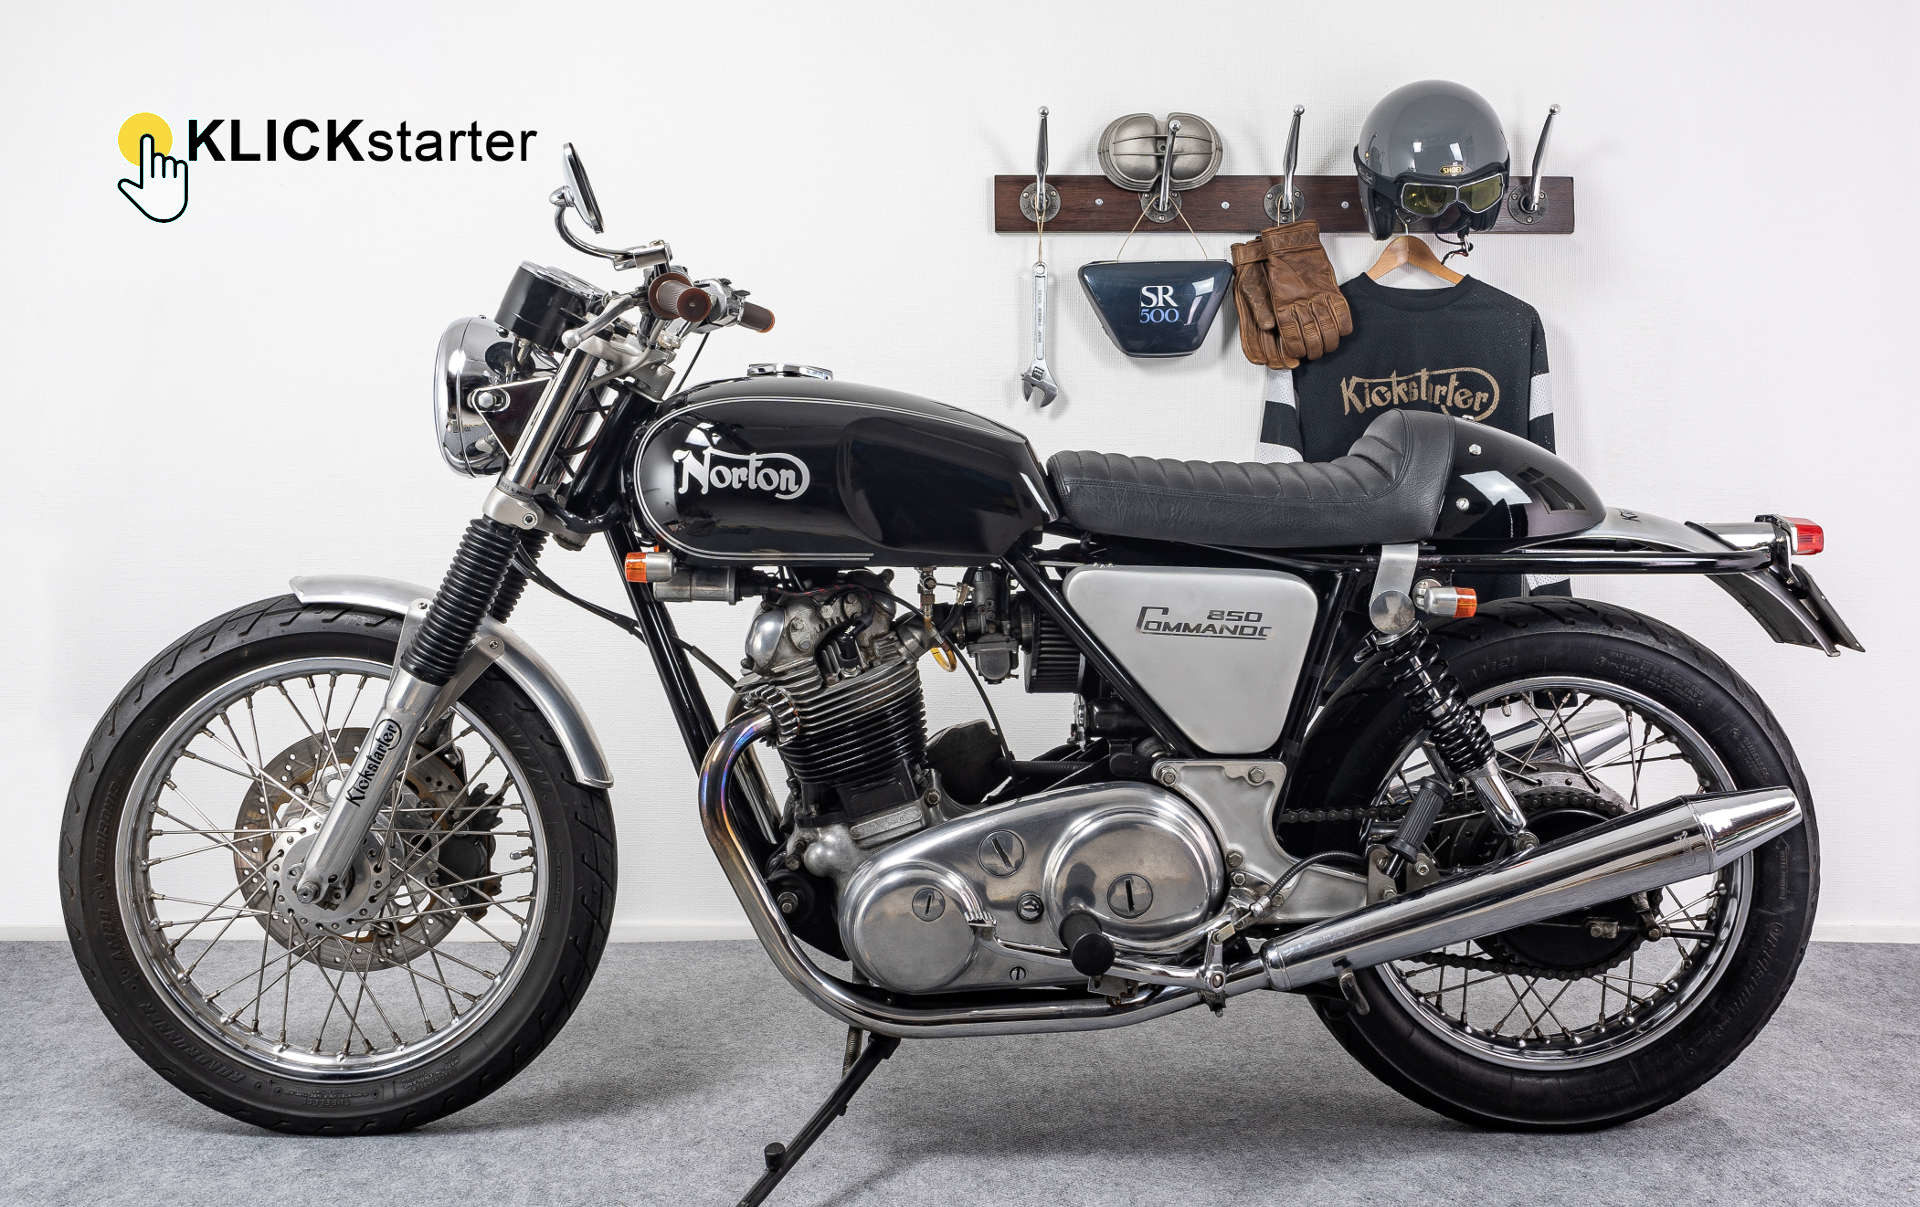 Kickstarter Shop Cafe Racer Scrambler Tracker Umbauteile